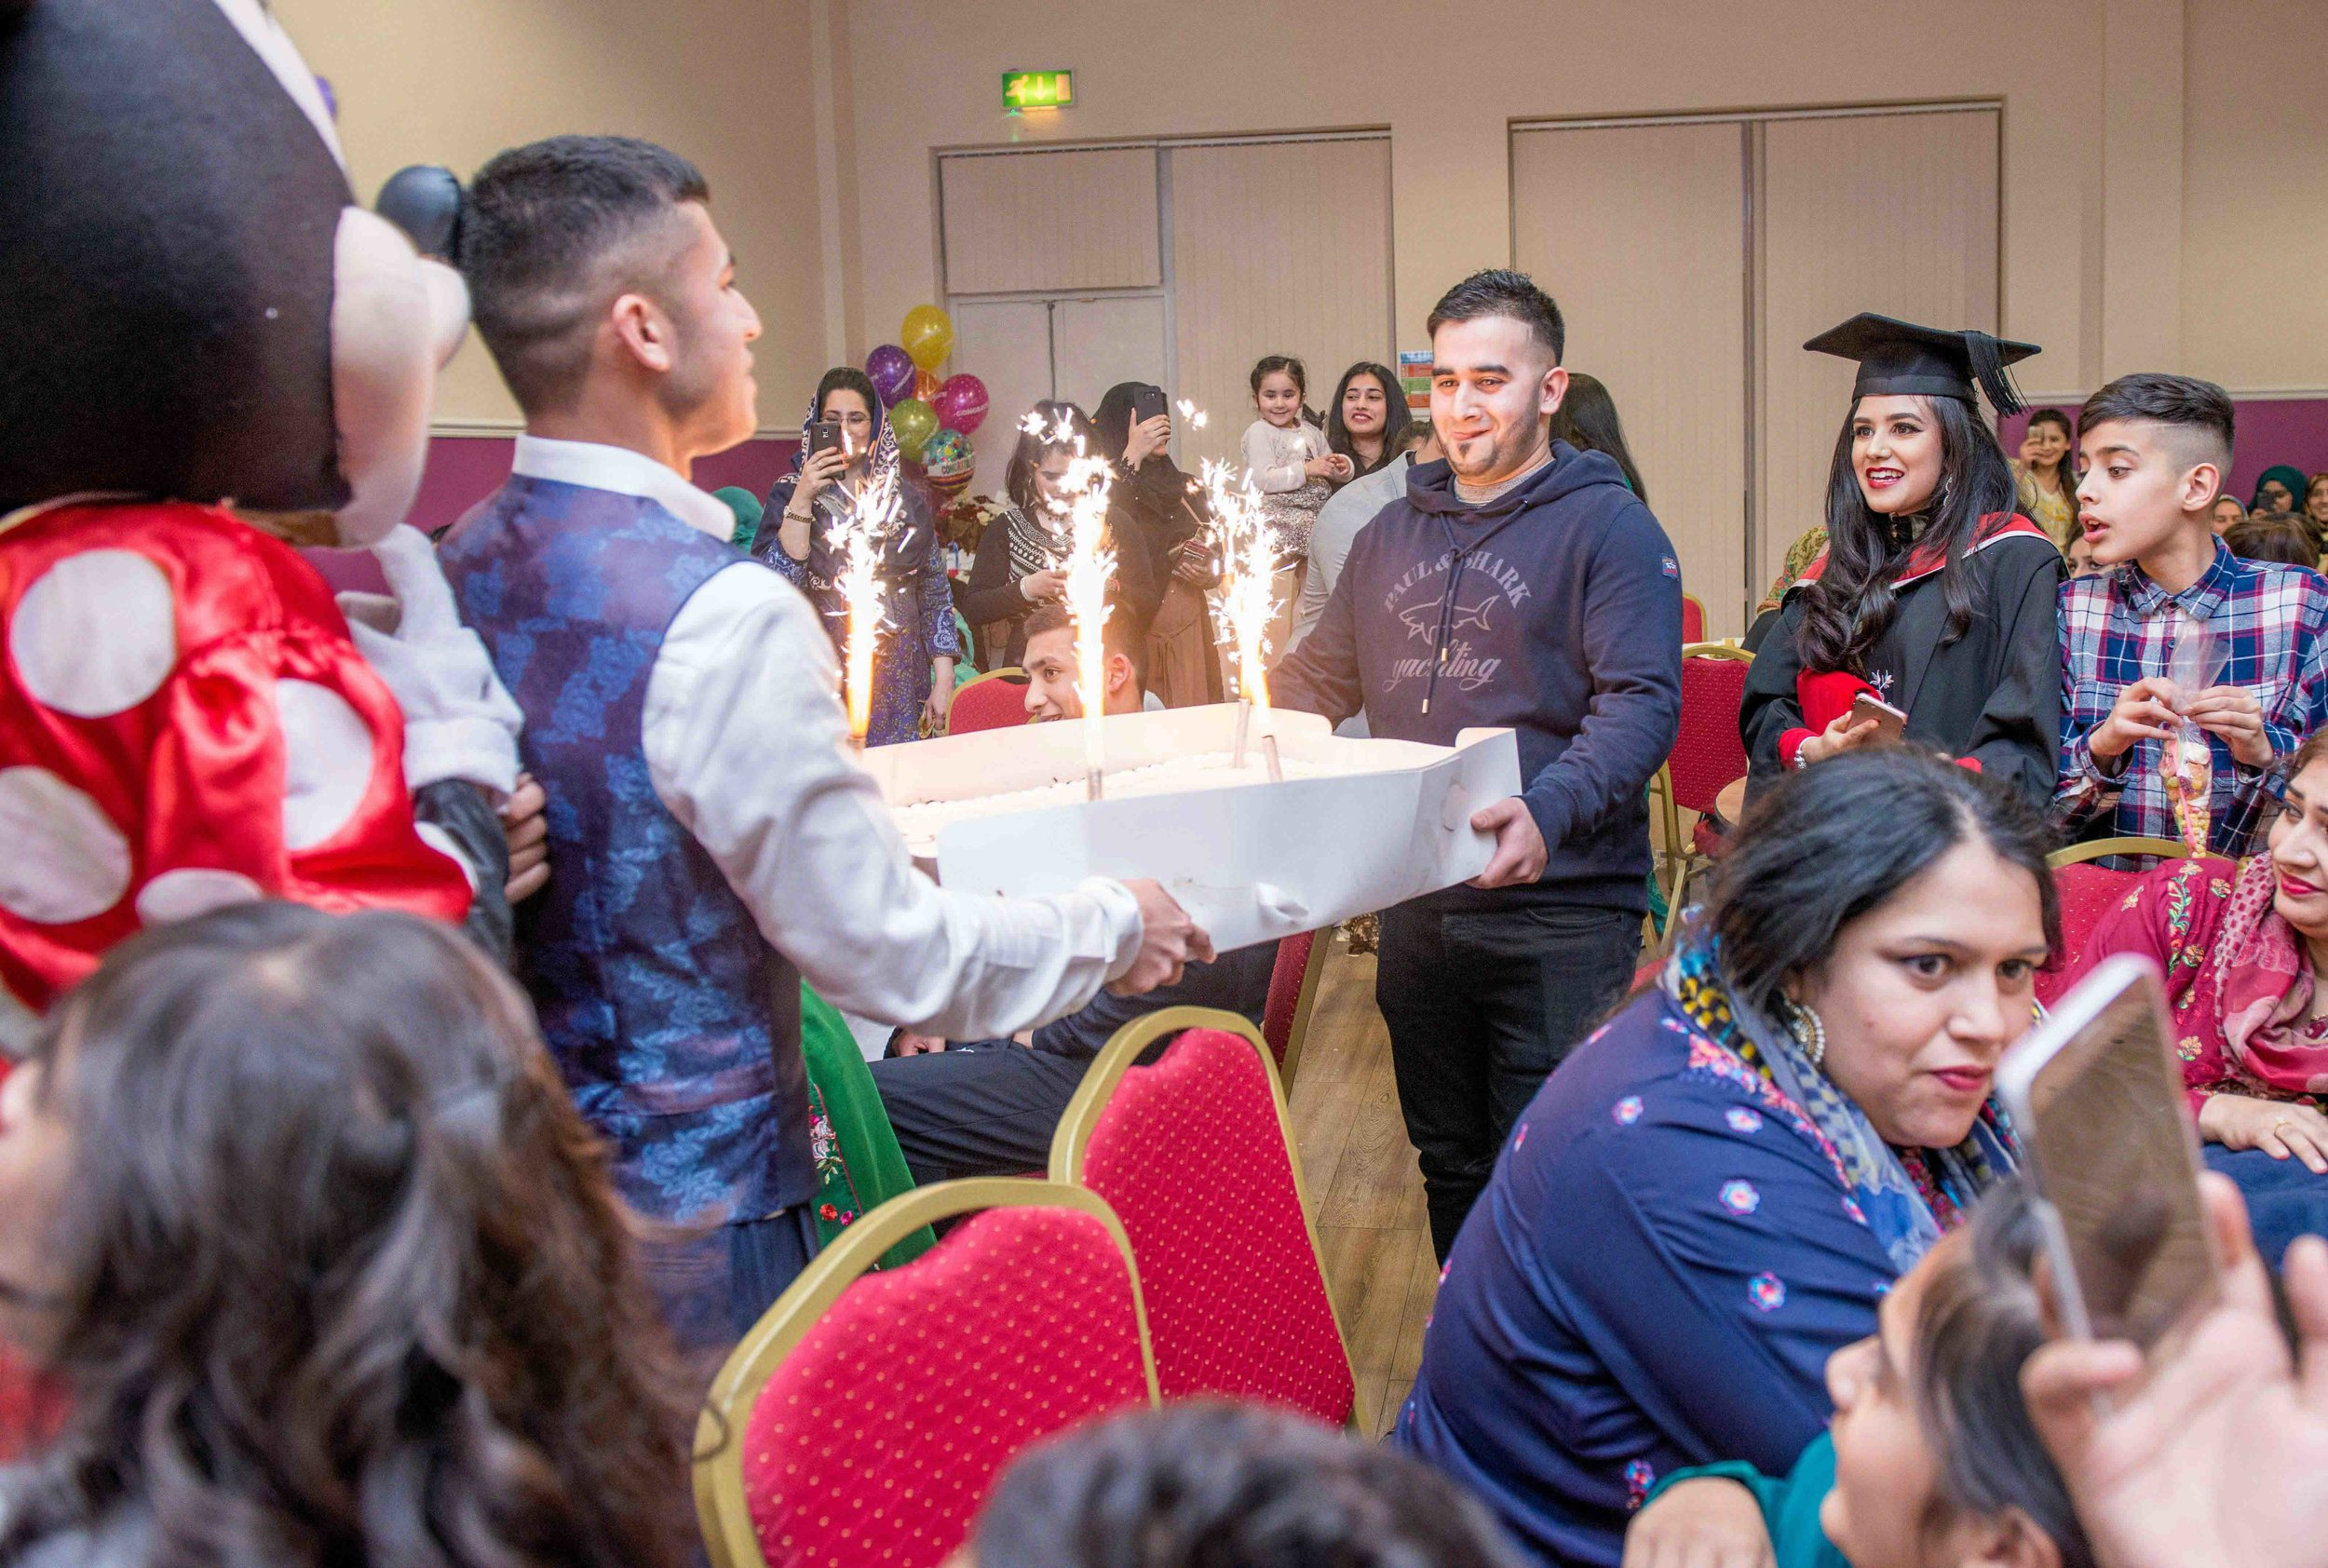 Graduation Party - 22nd November 2017, Mayfield Centre, Bradford